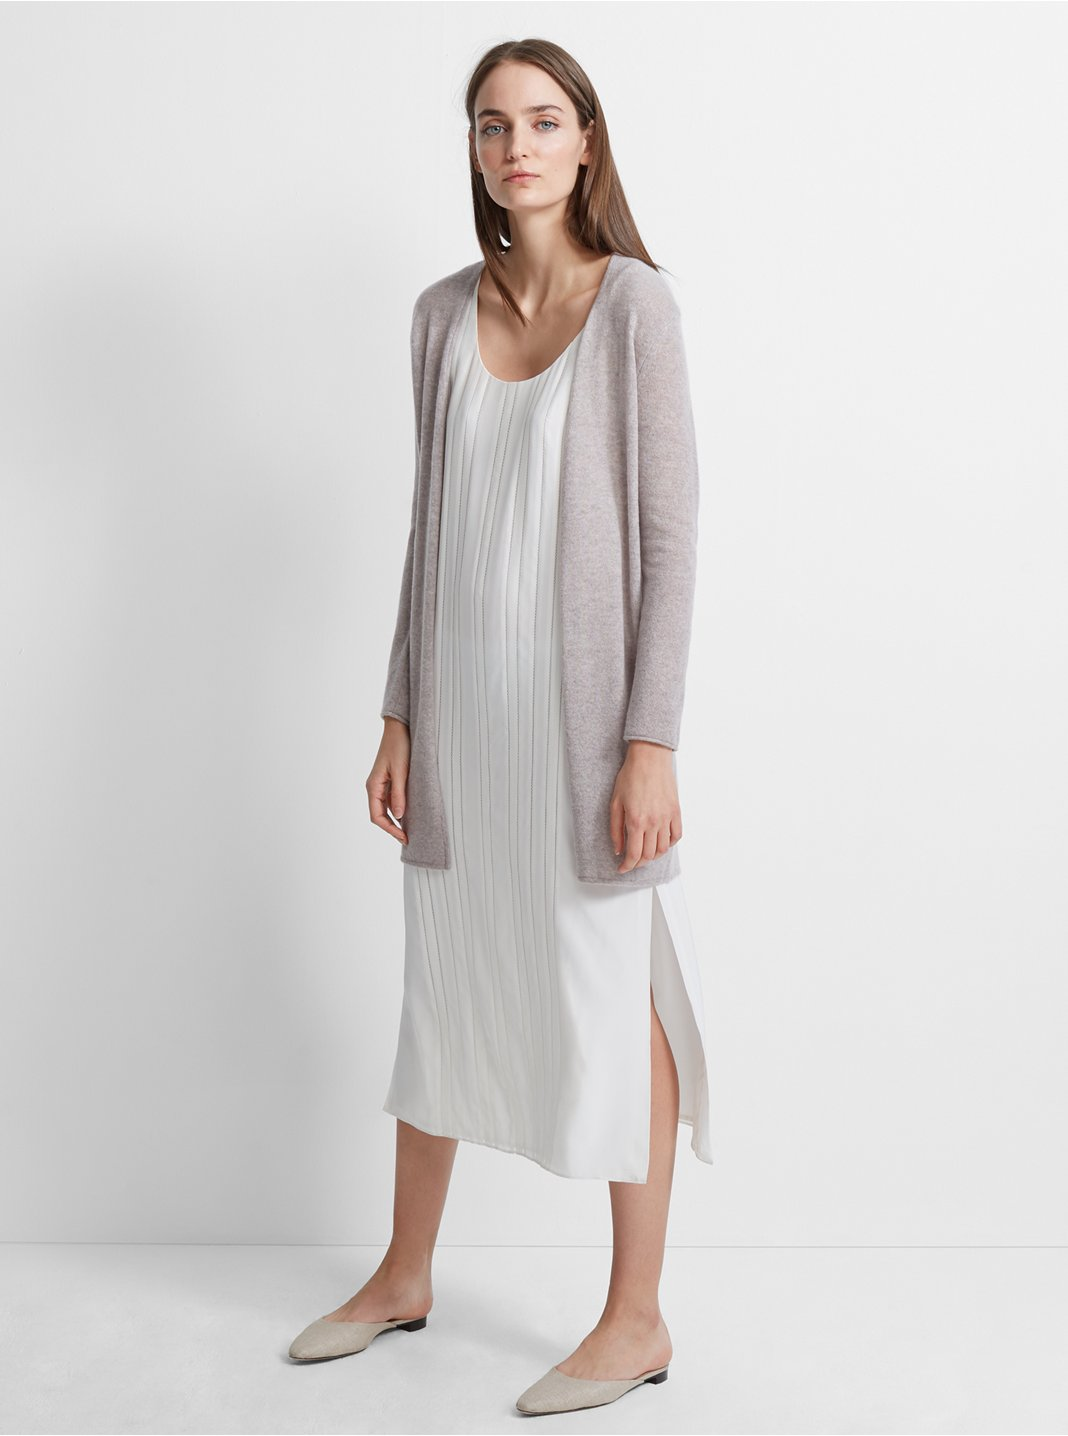 Holina Cashmere Sweater